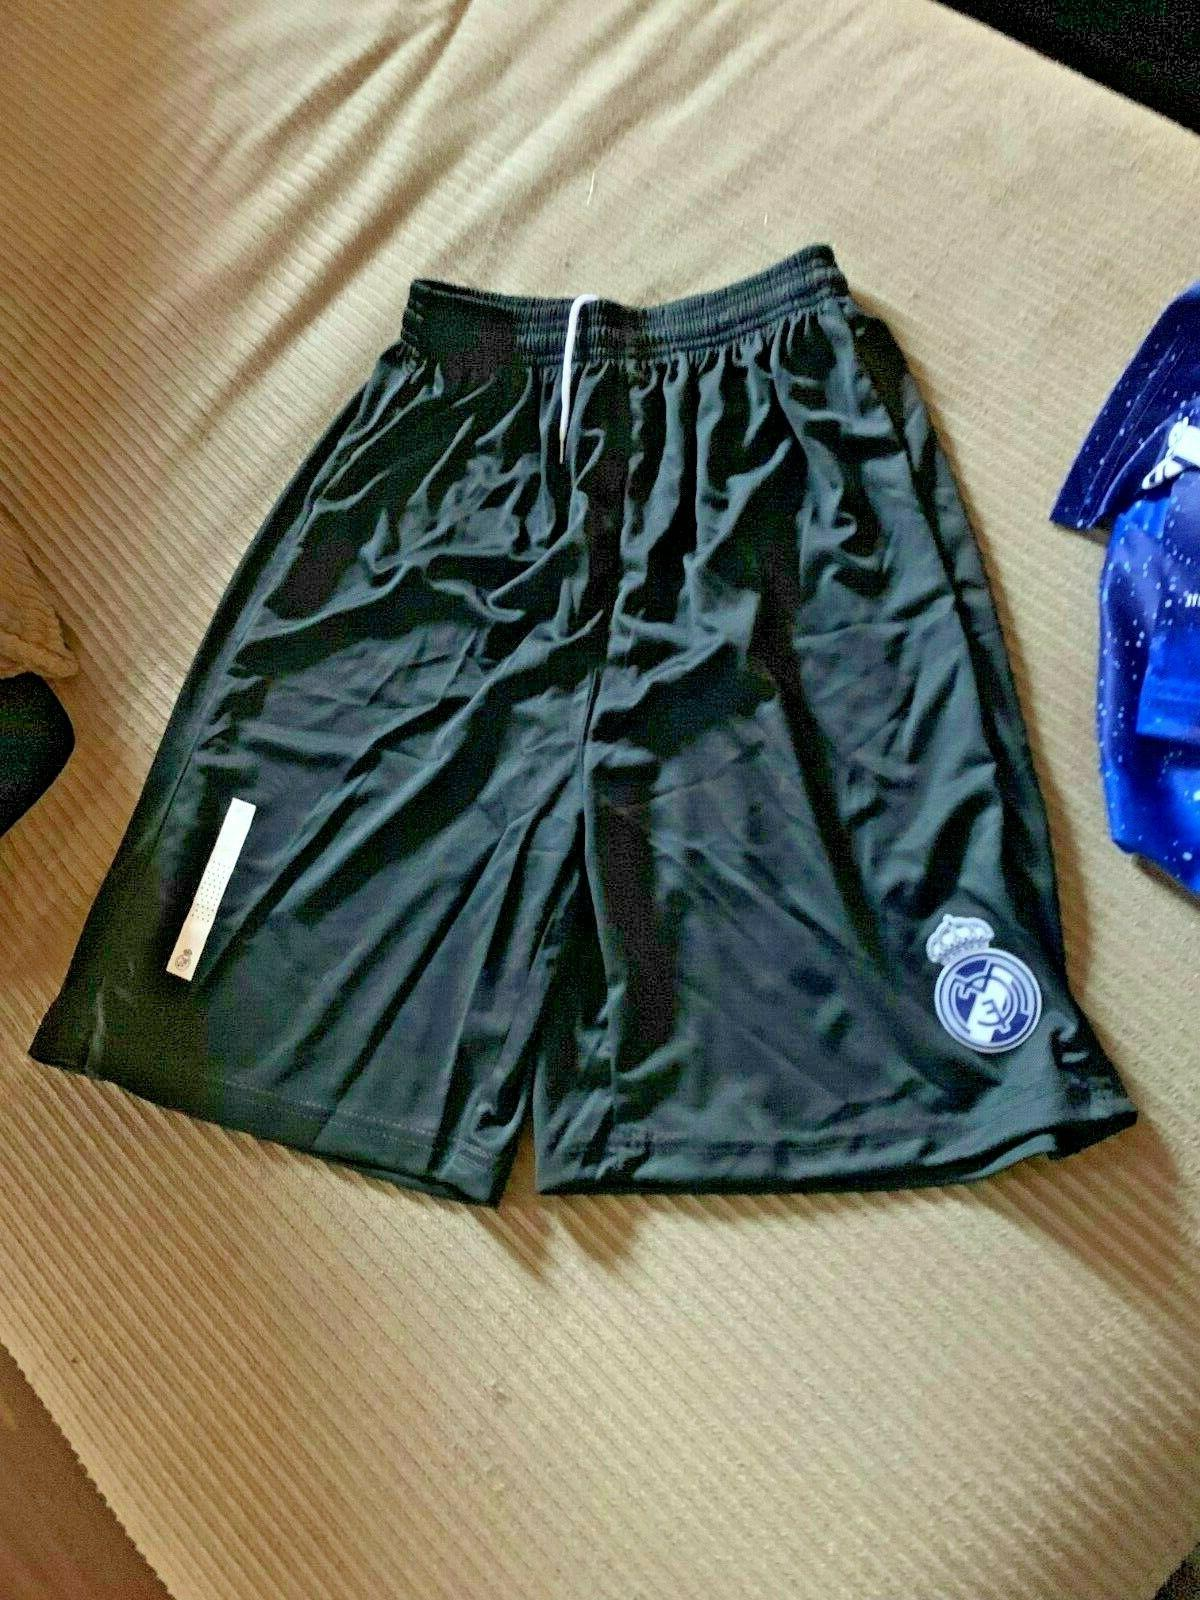 Adidas Sports Uniform